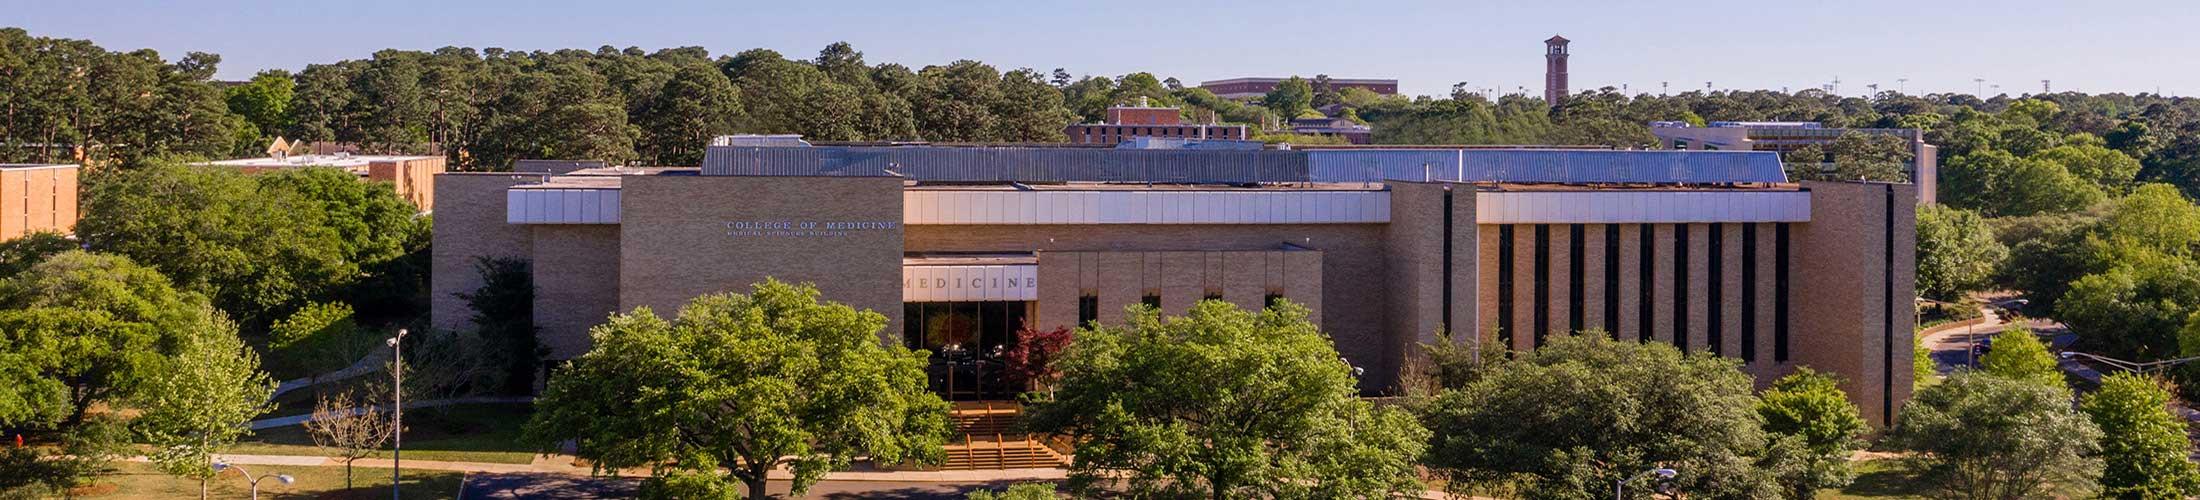 College of Medicine Building